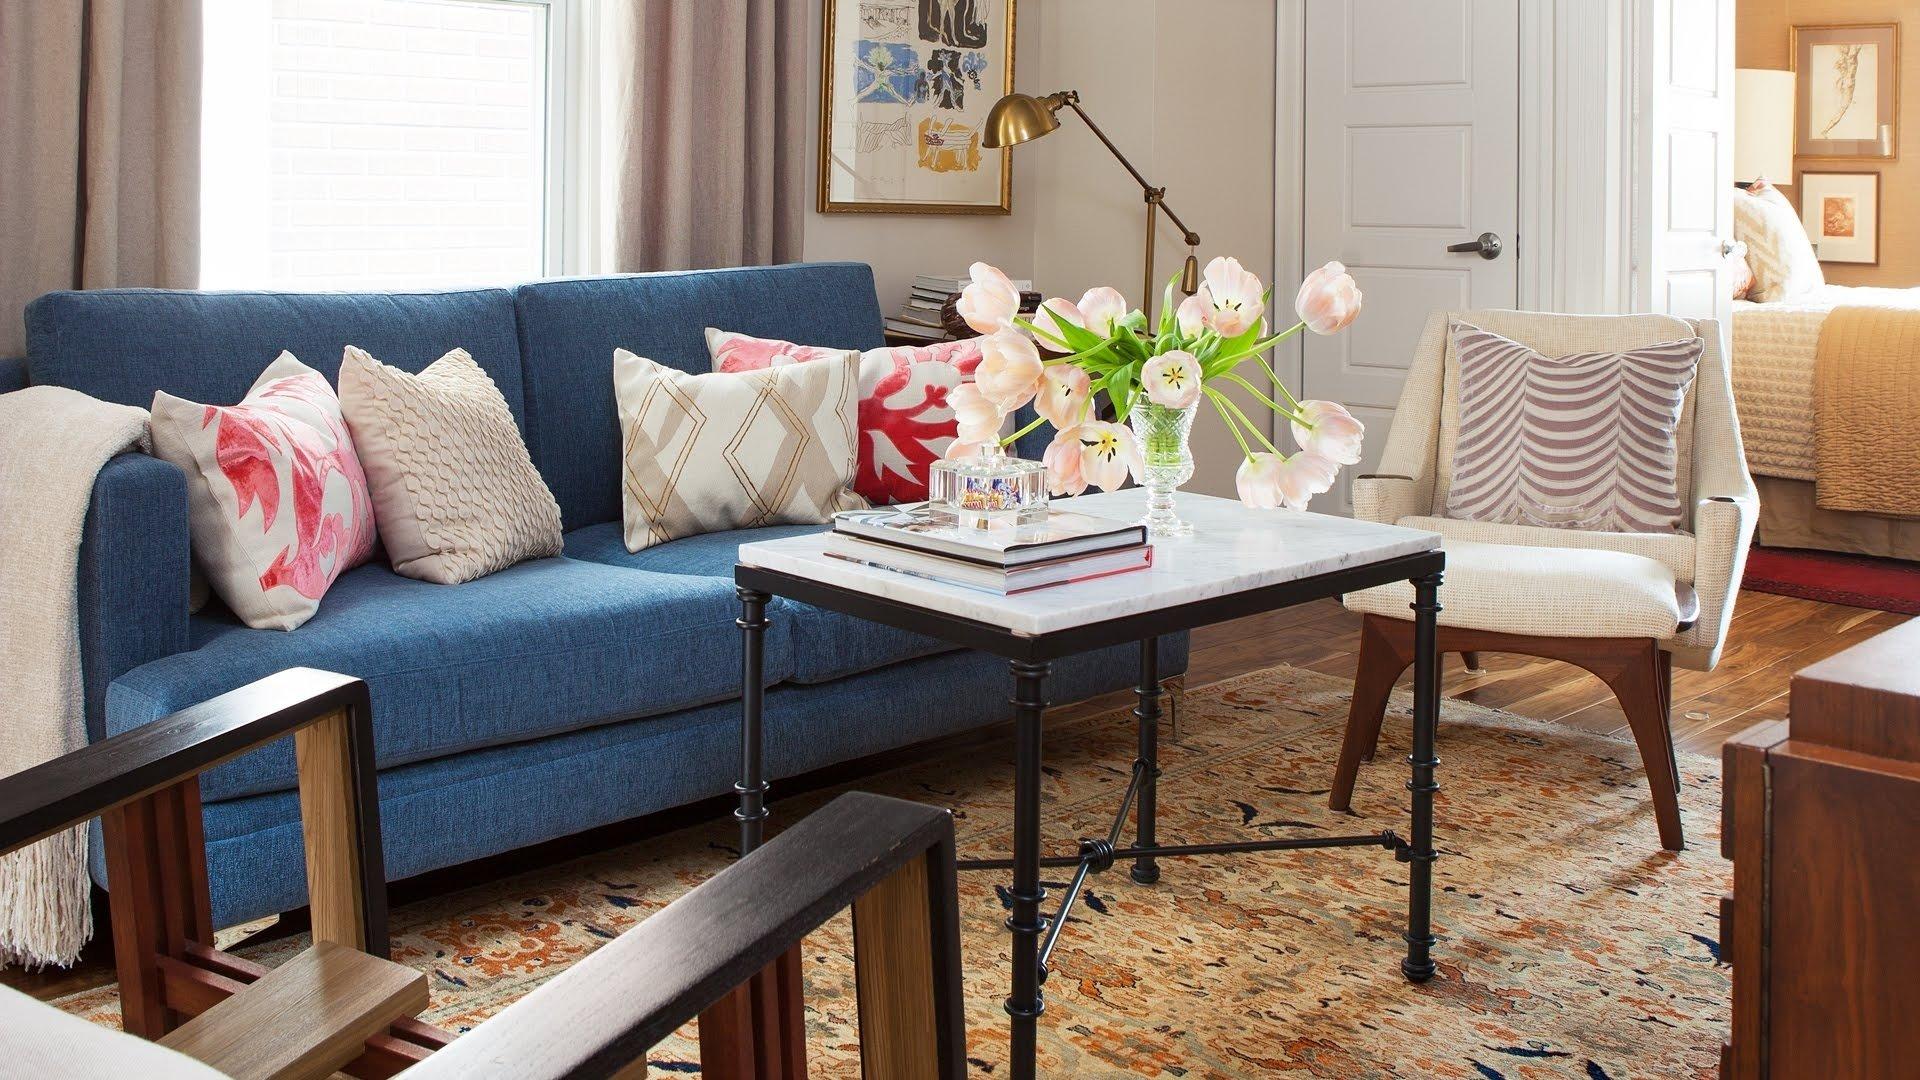 10 Gorgeous Interior Design Ideas For Small Spaces interior design smart small space decorating ideas youtube 1